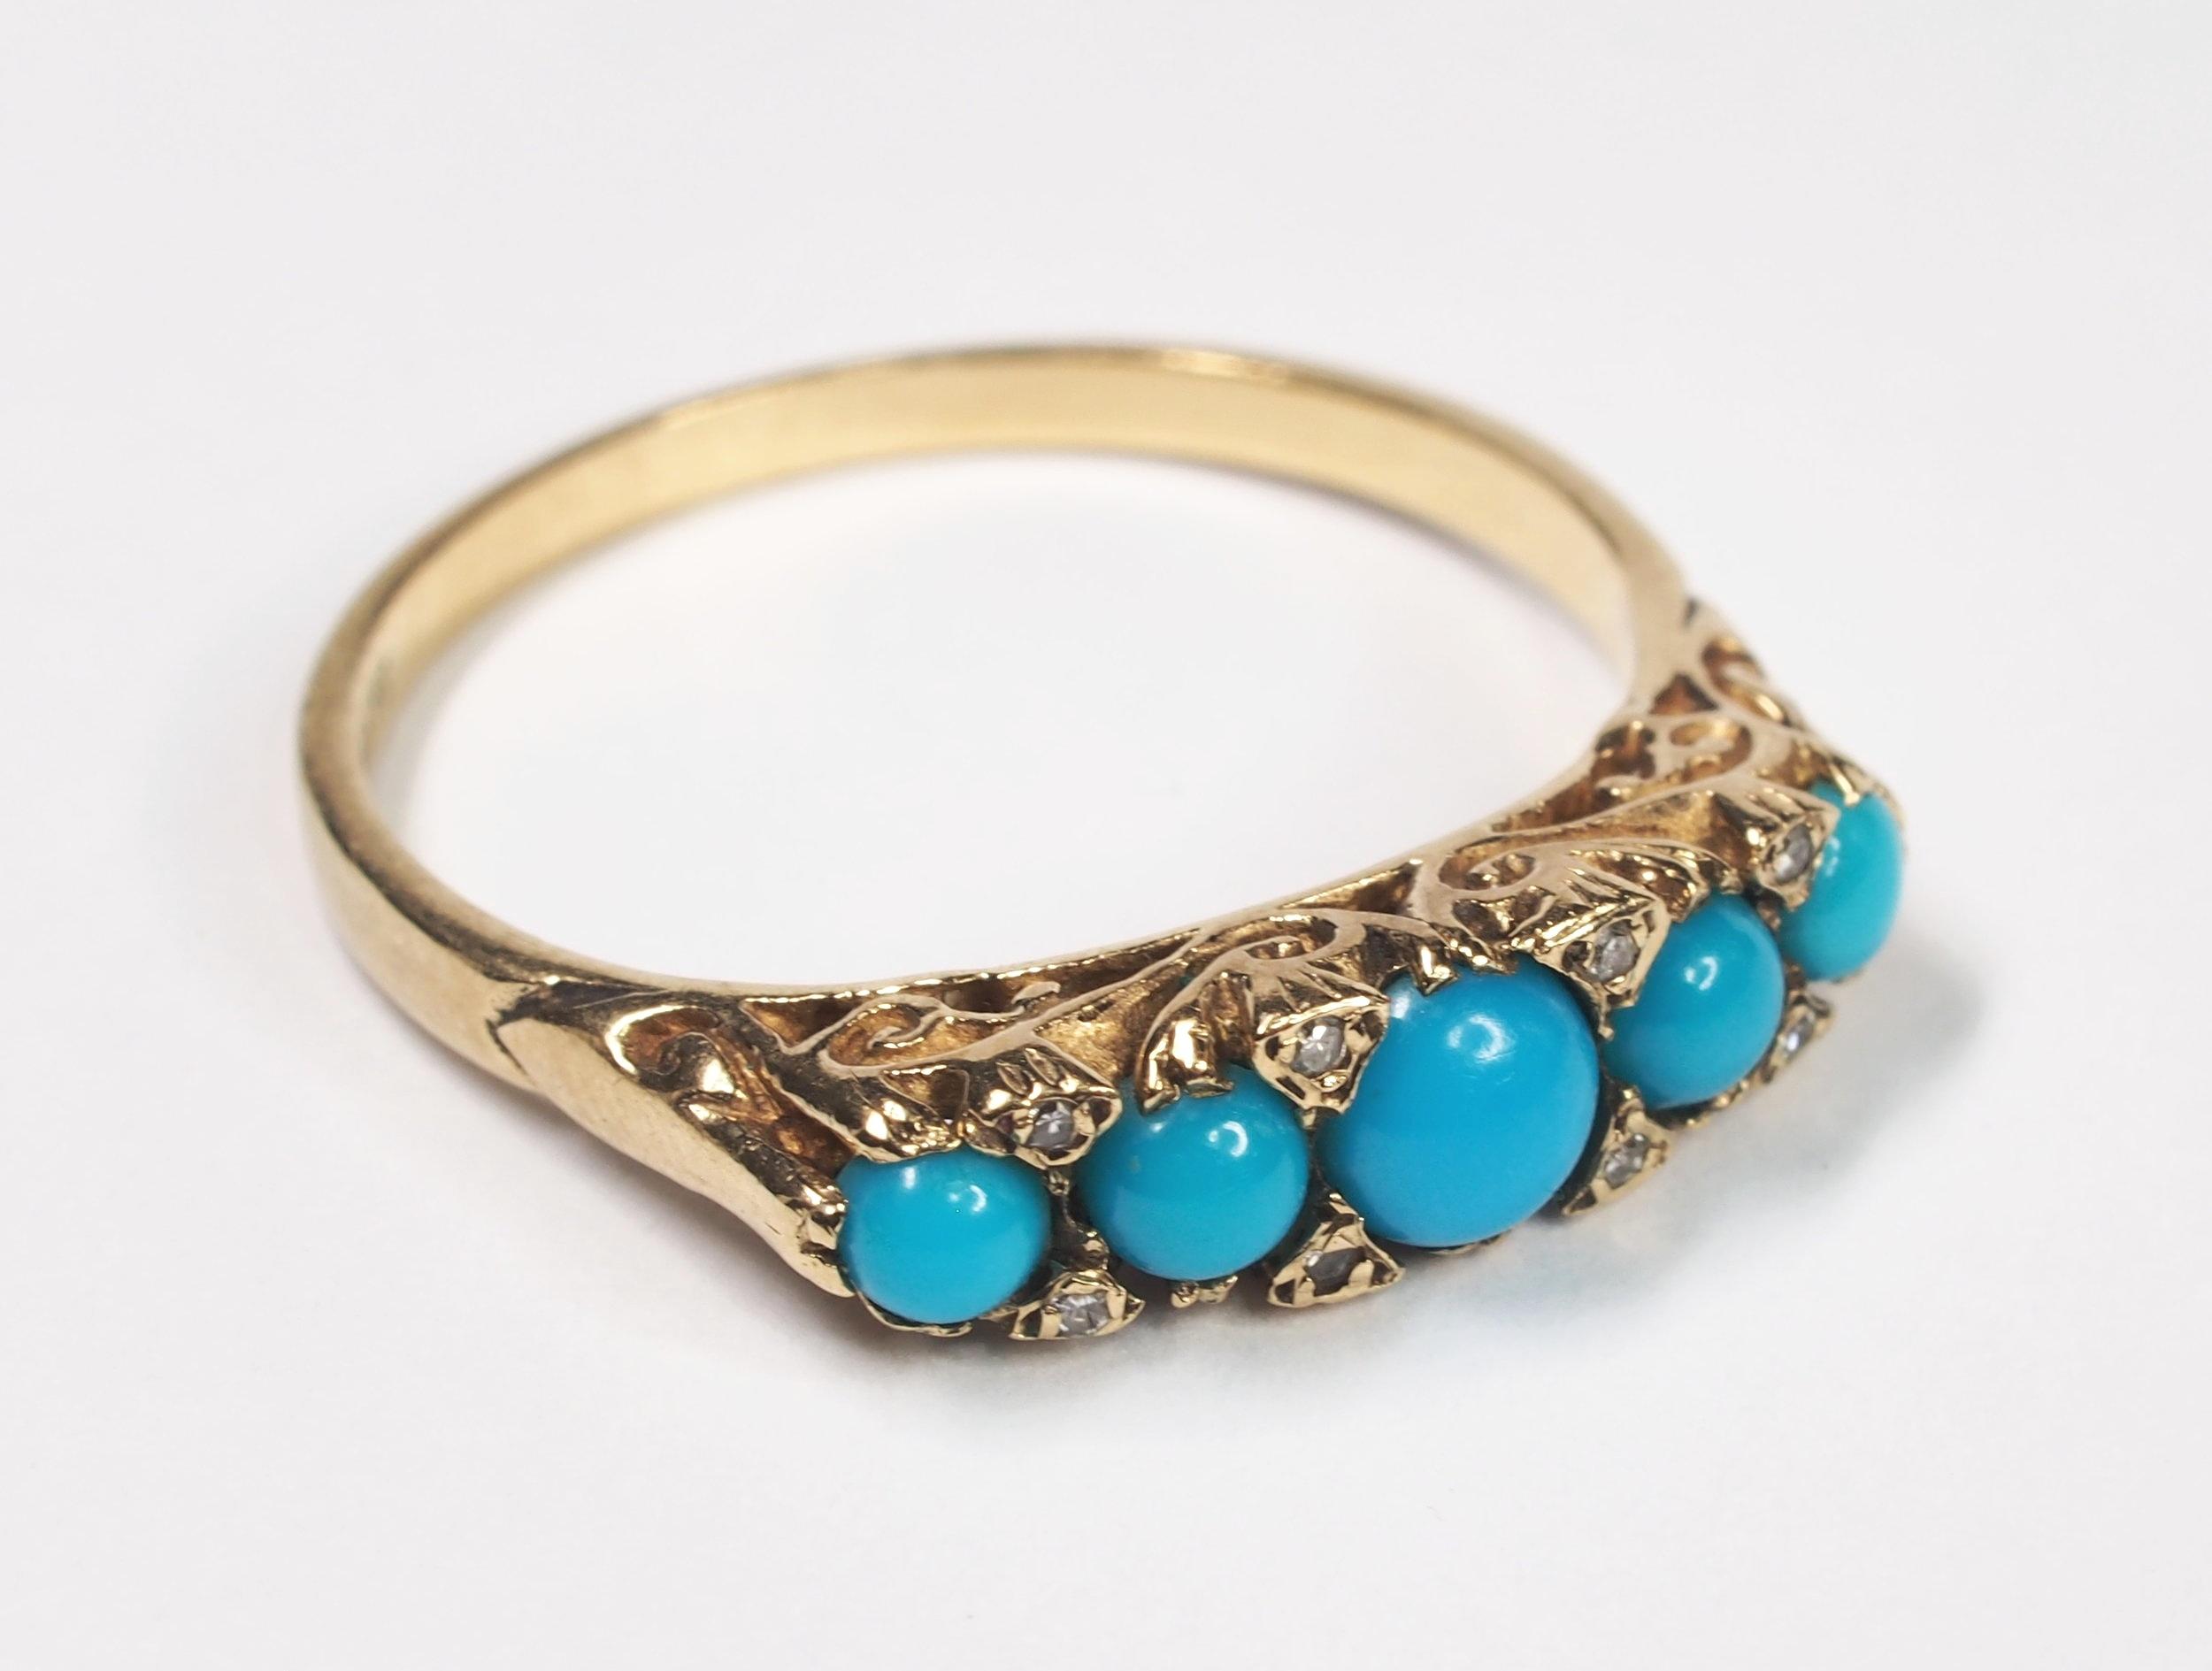 london+bridge+vintage+turquoise+ring_1.jpg